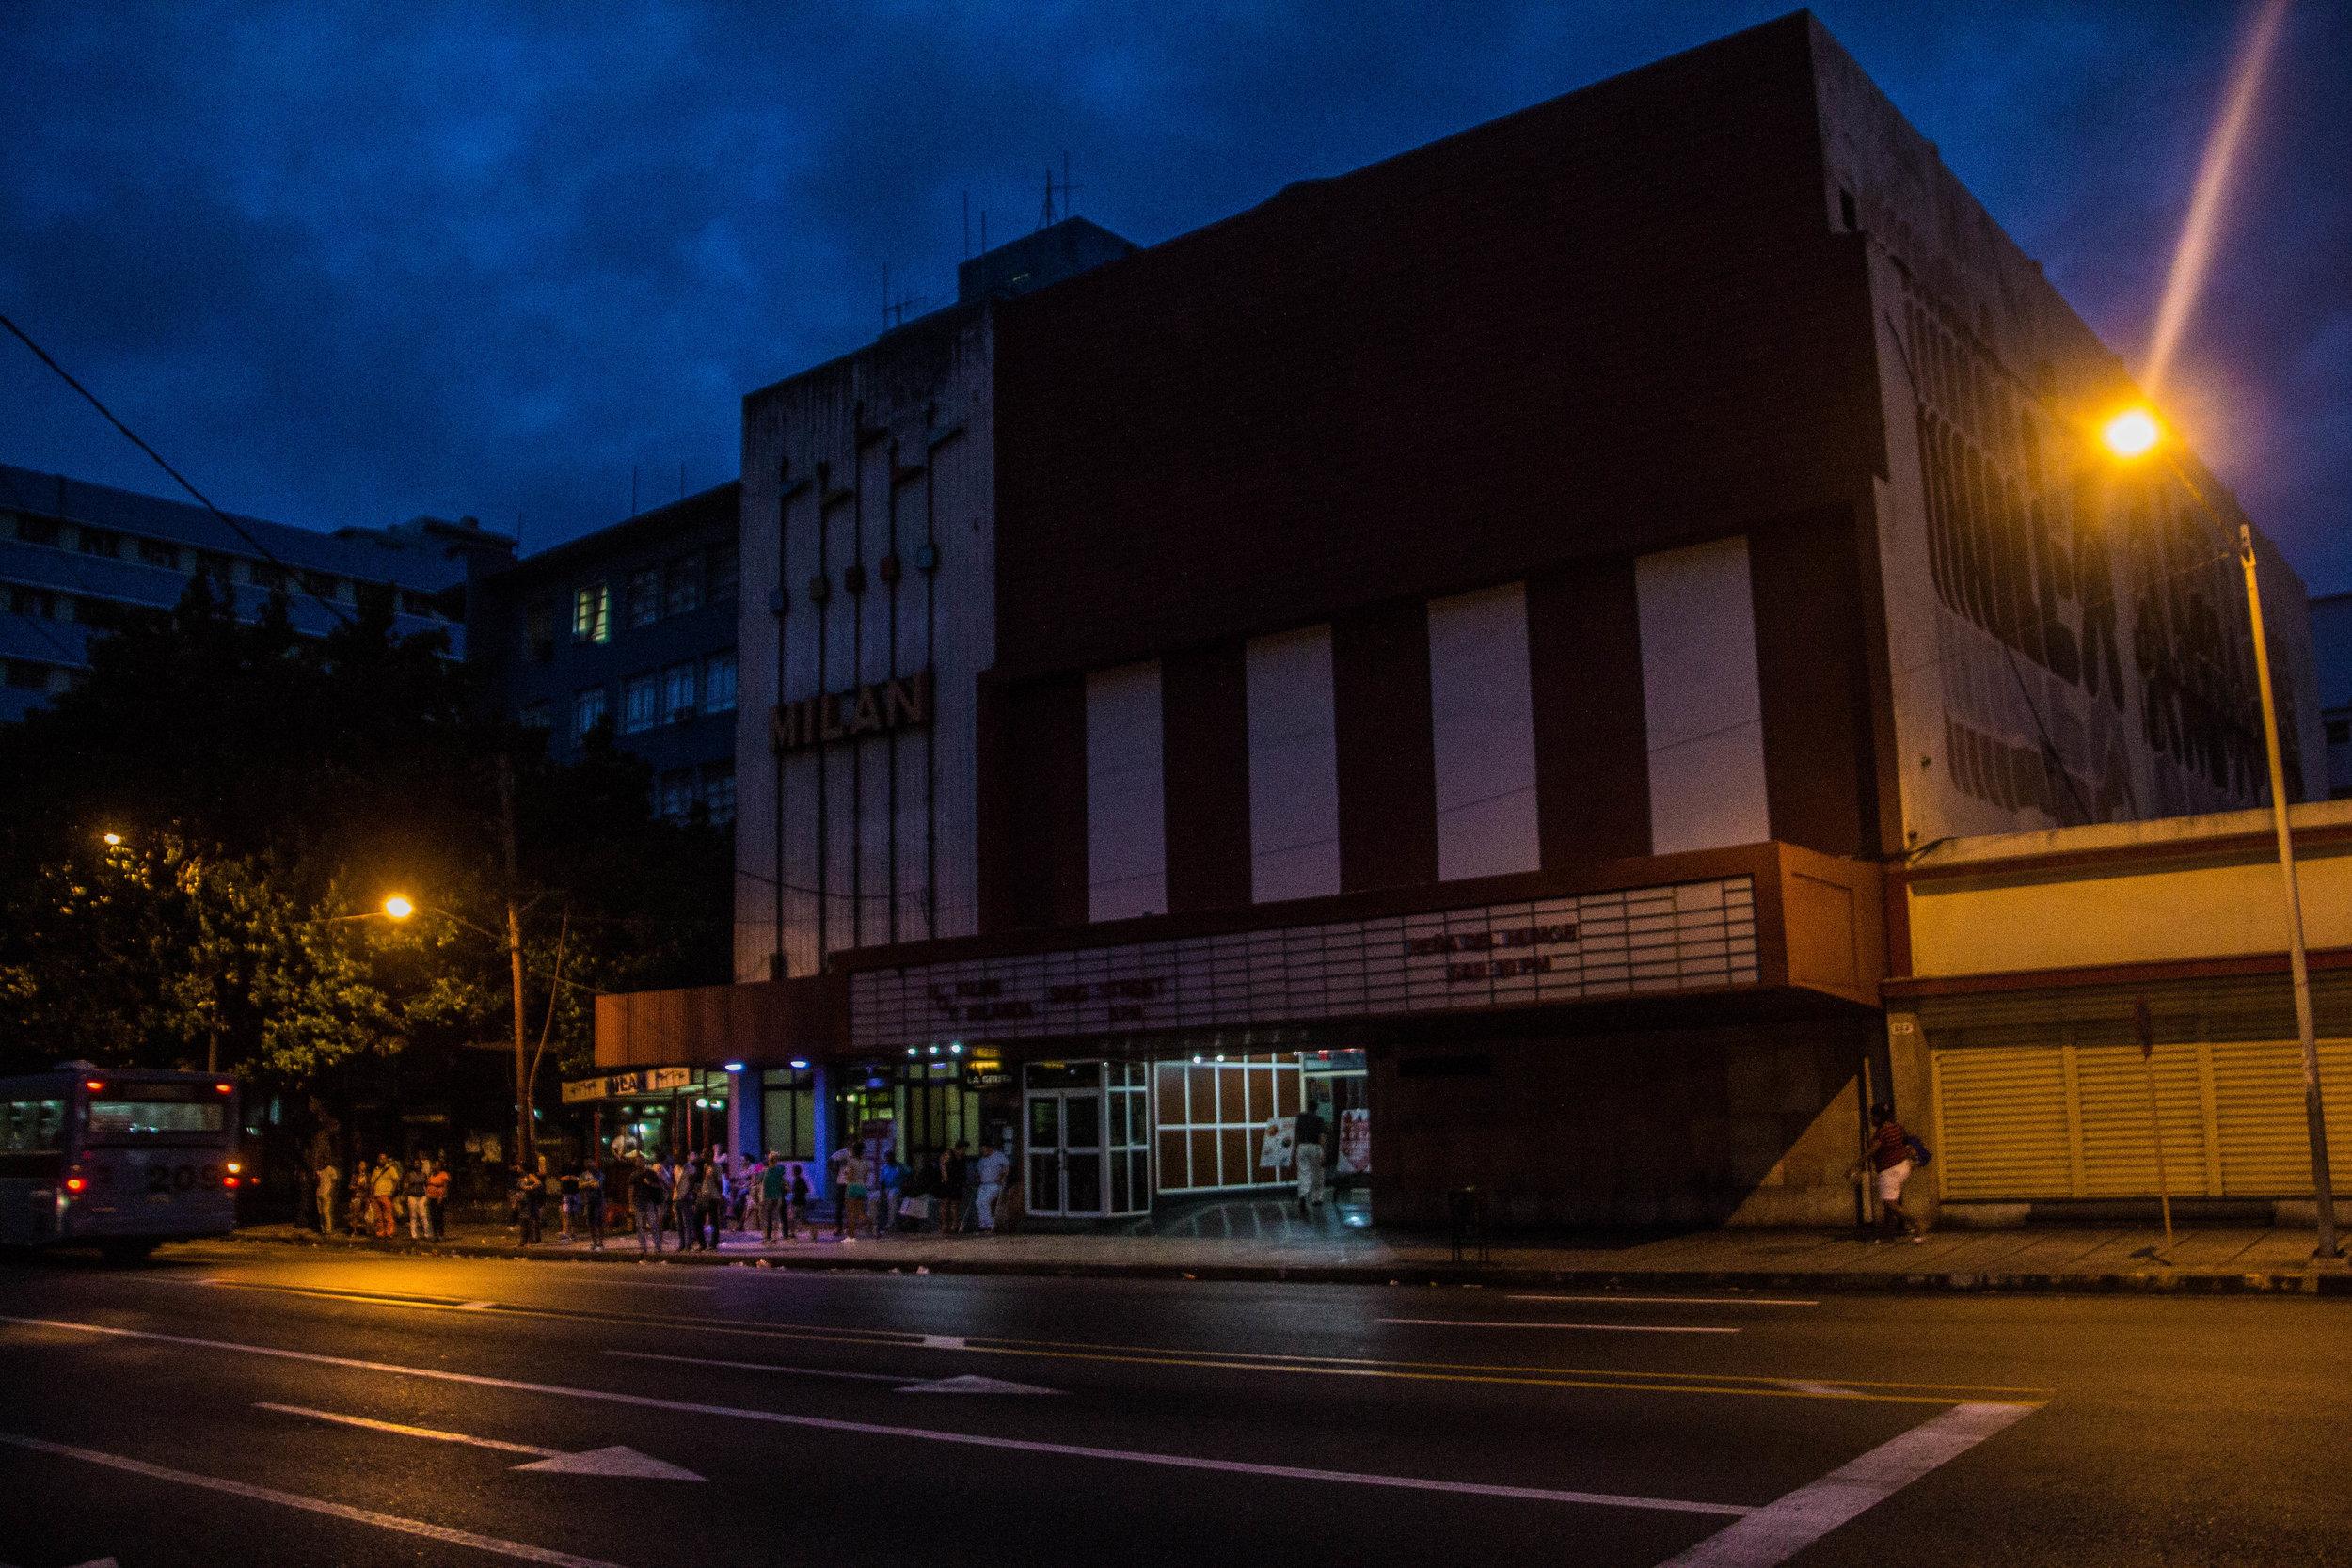 milan movie theater vedado havana cuba-1-2.jpg